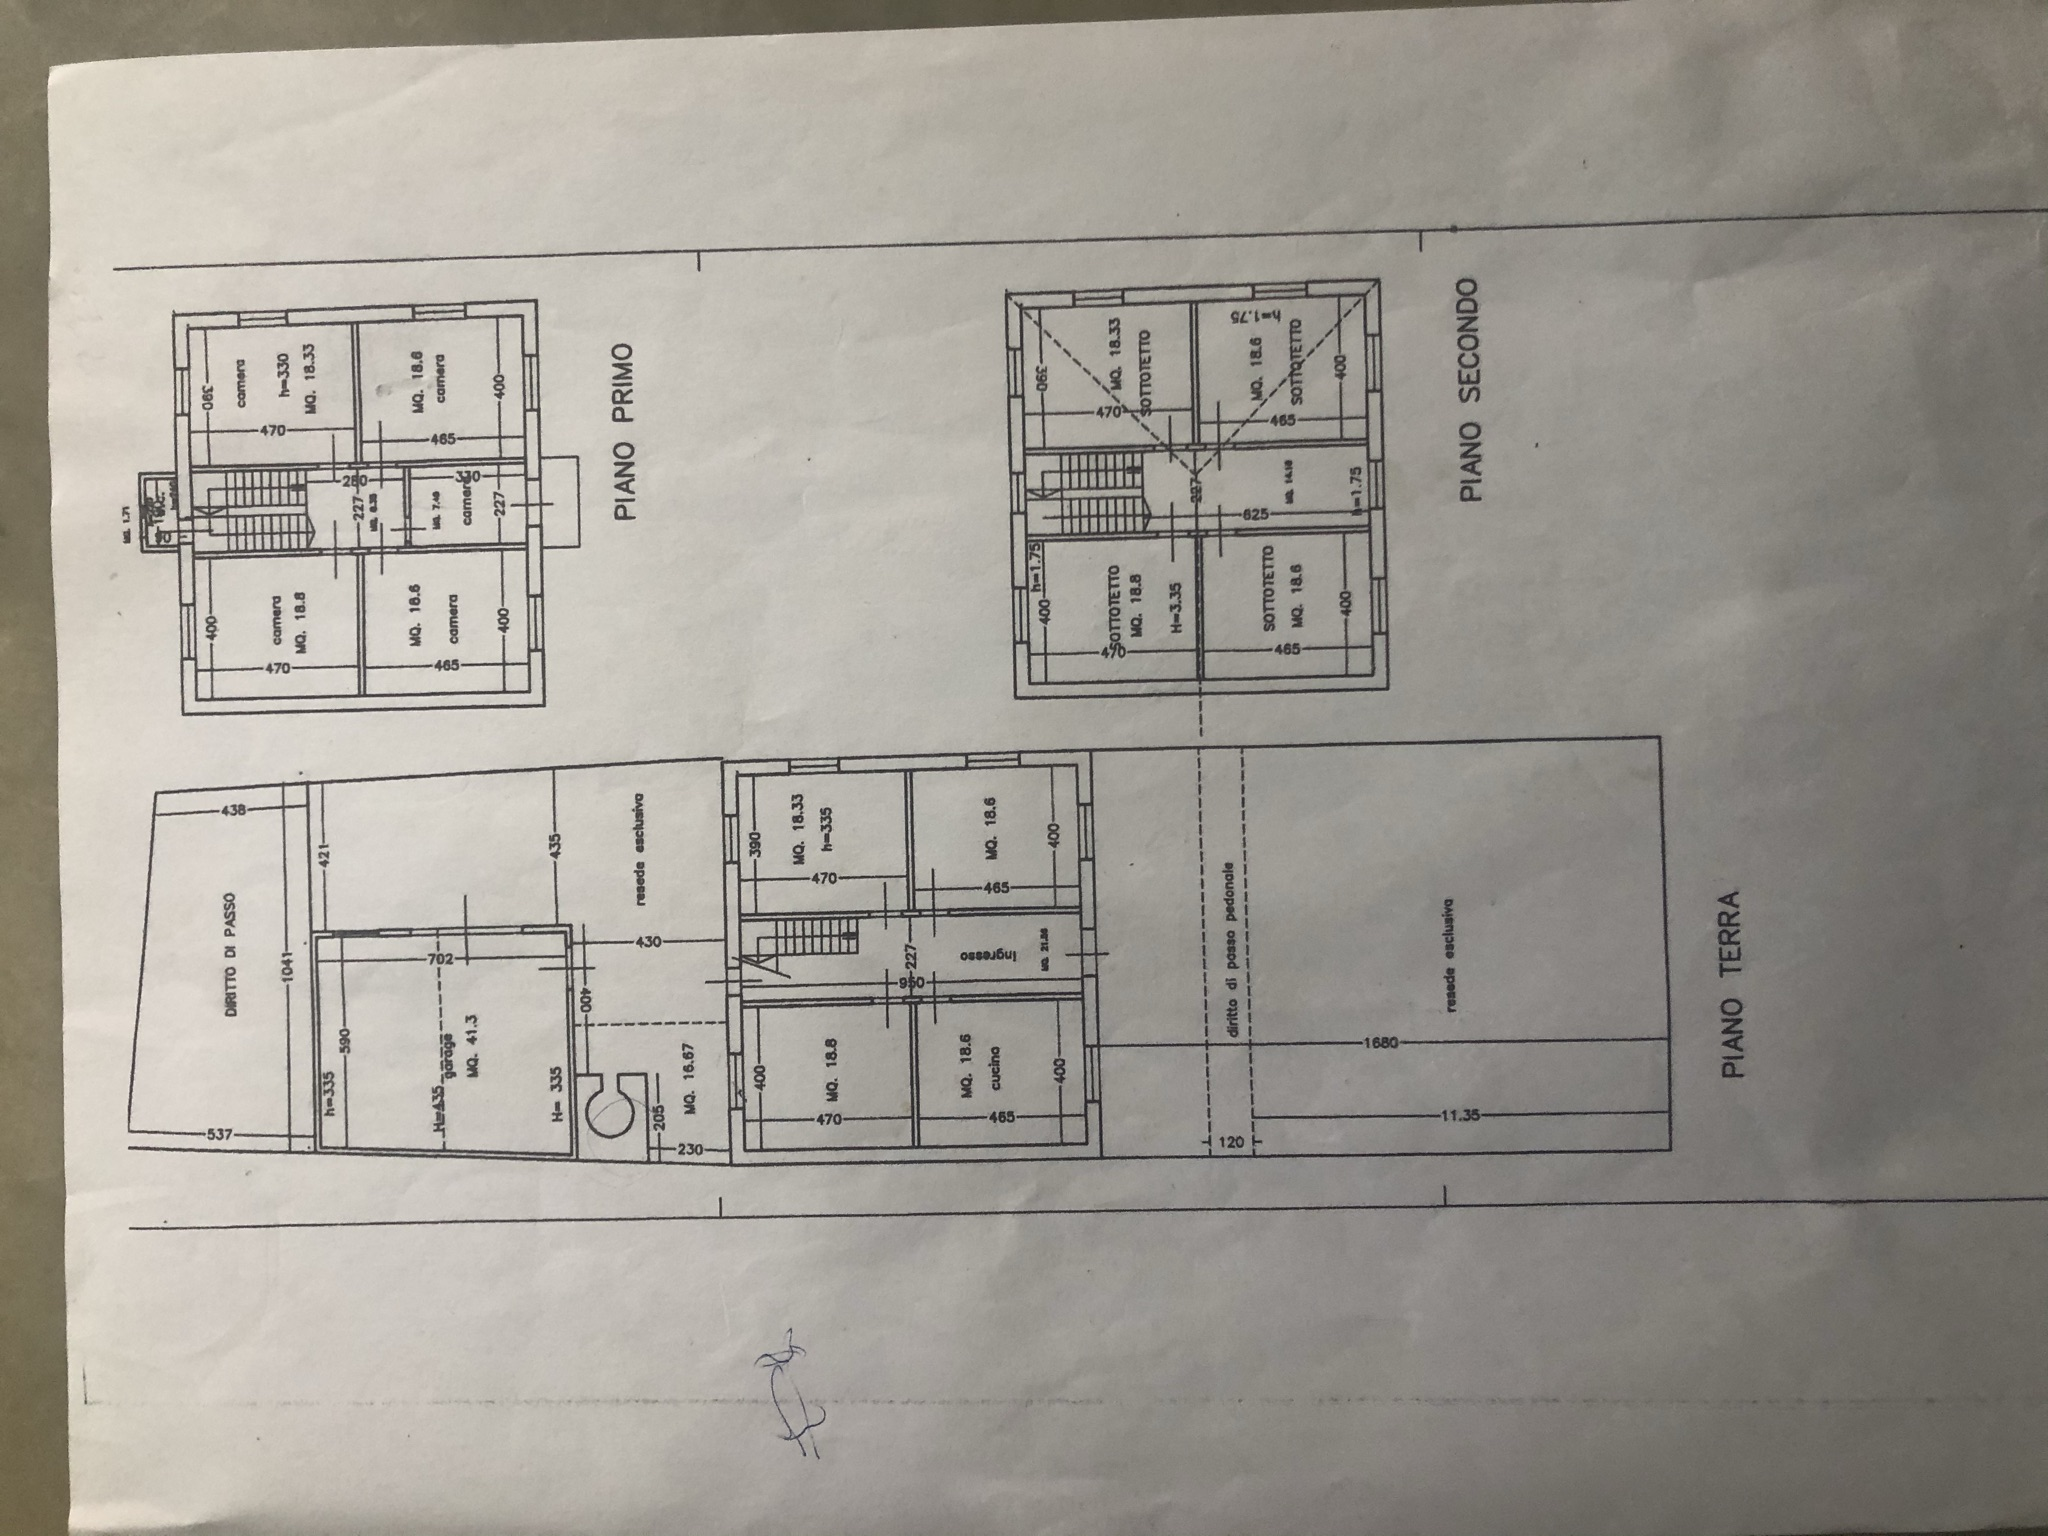 Planimetria 1/1 per rif. trf oren 130